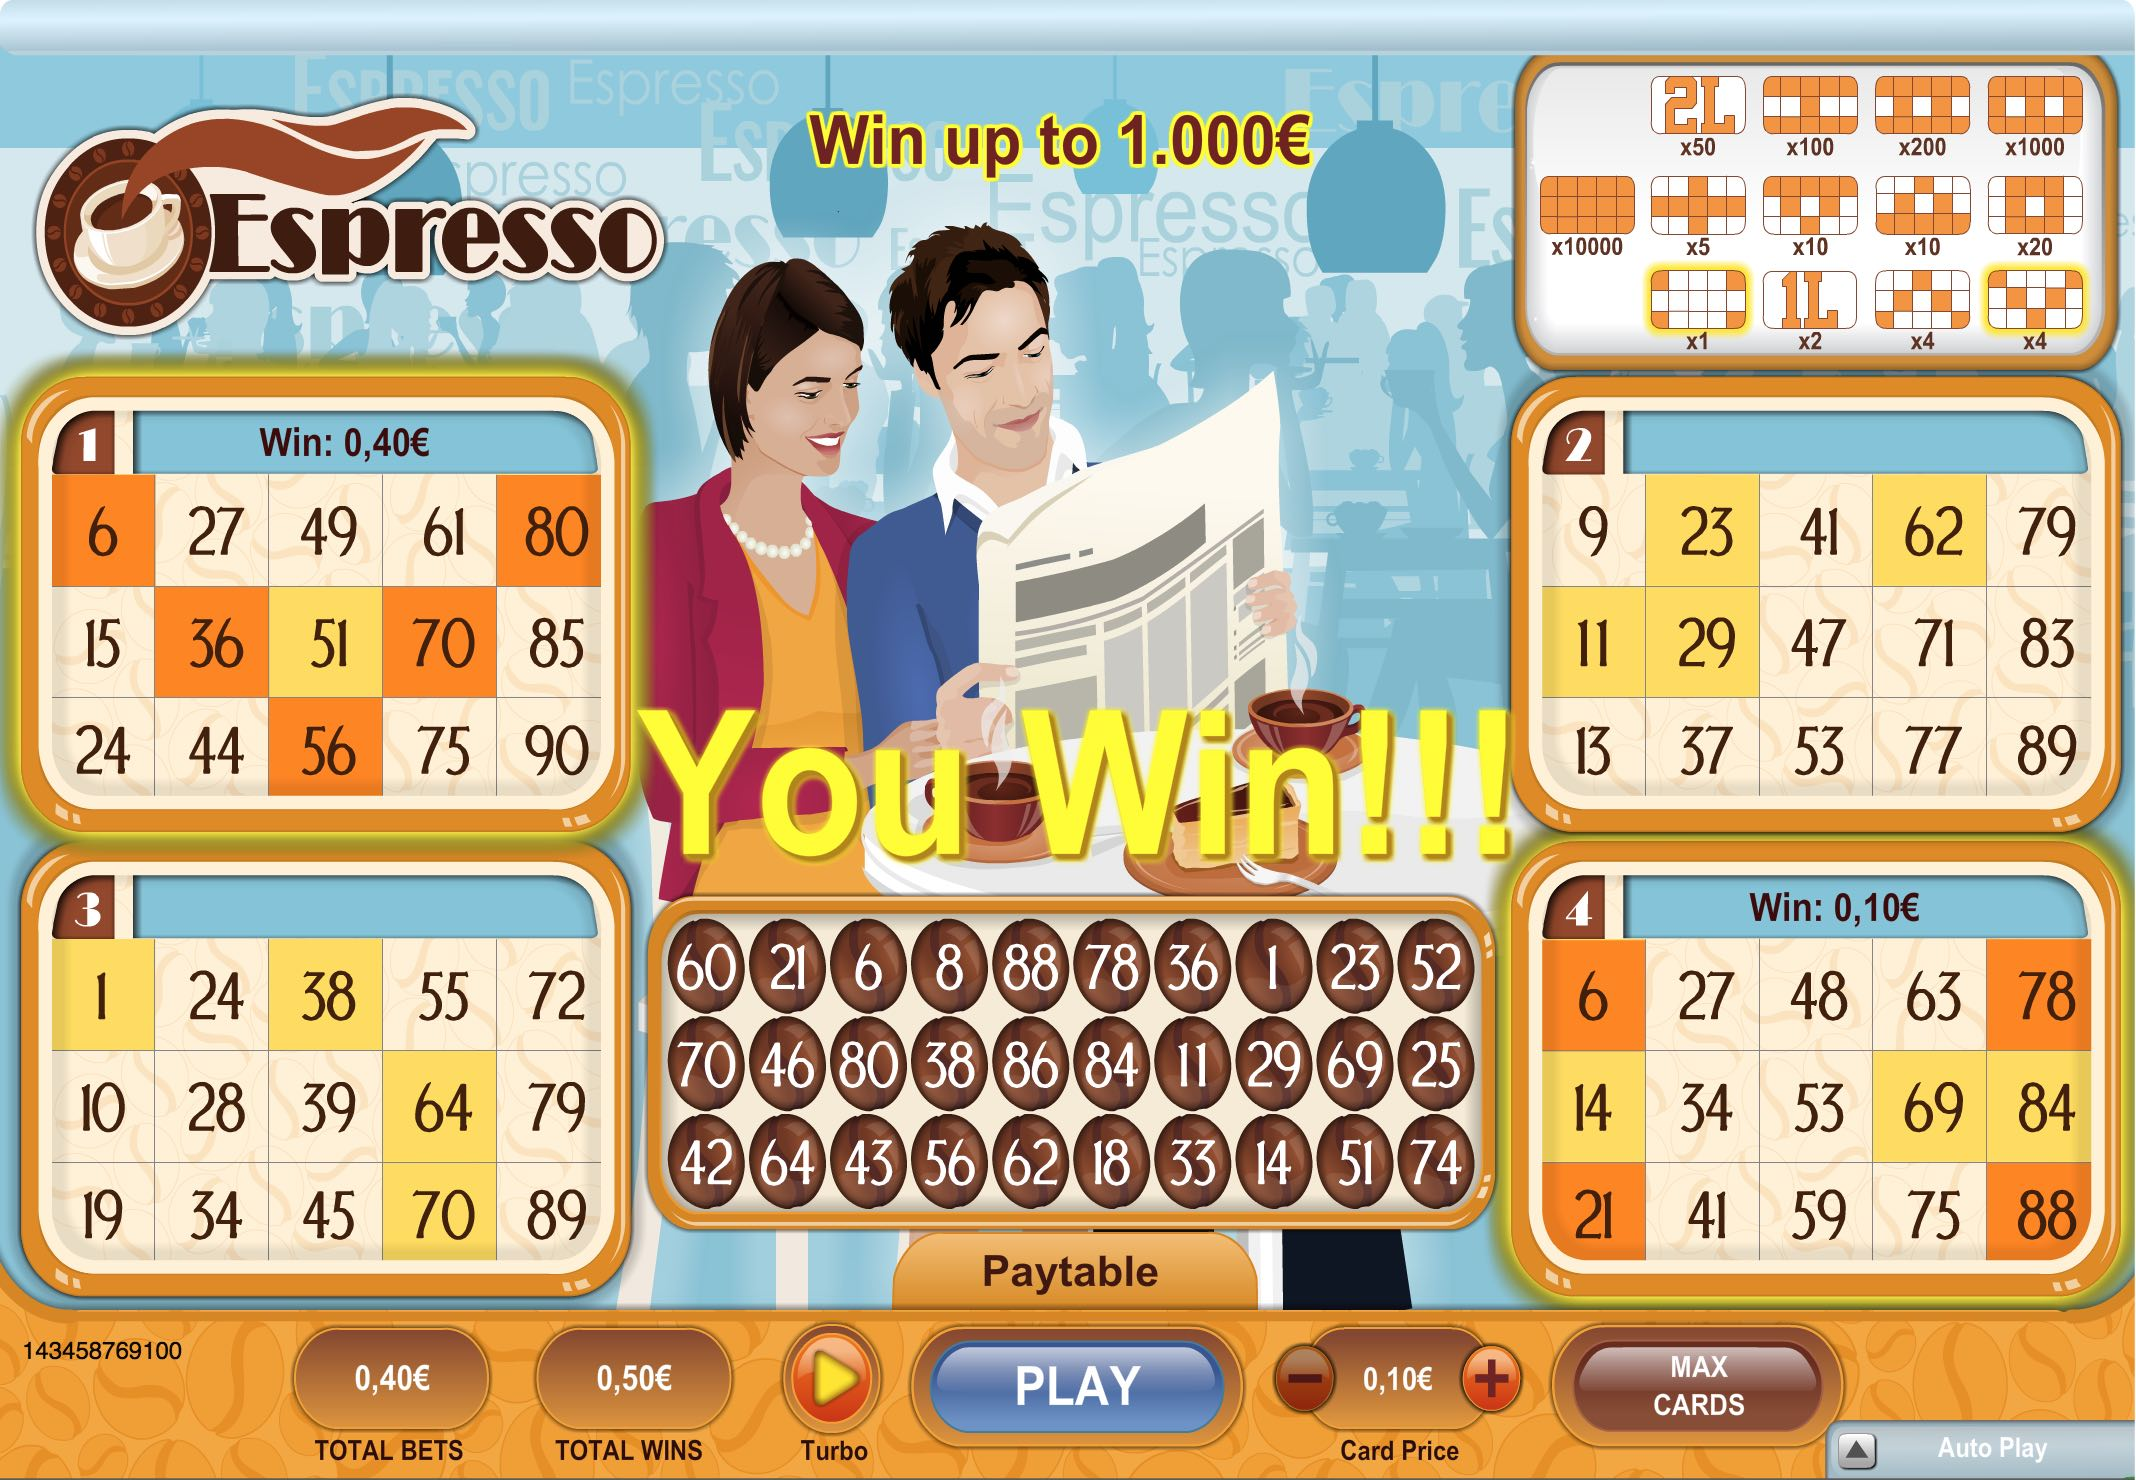 K-E-N-O laimesti - padomi - Espresso spēle online casino